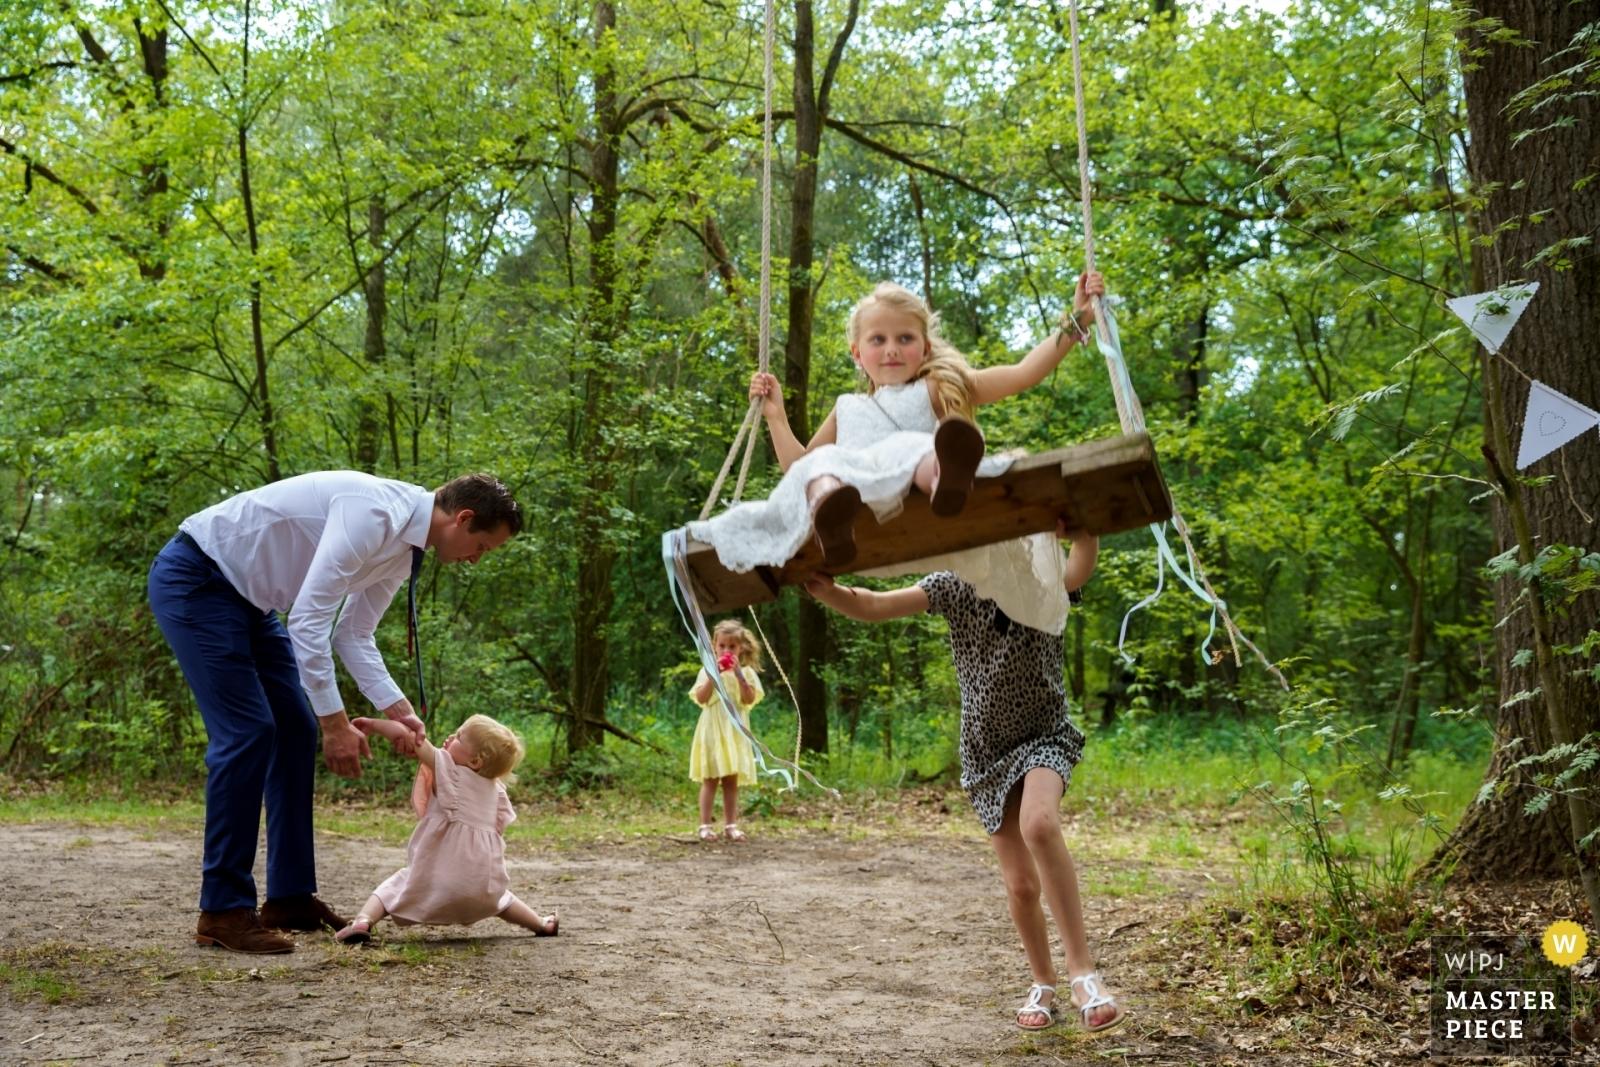 watch out for the swing! - Overijssel, Netherlands Wedding Photography -    De Lutte, Jan Wesselinkhoes